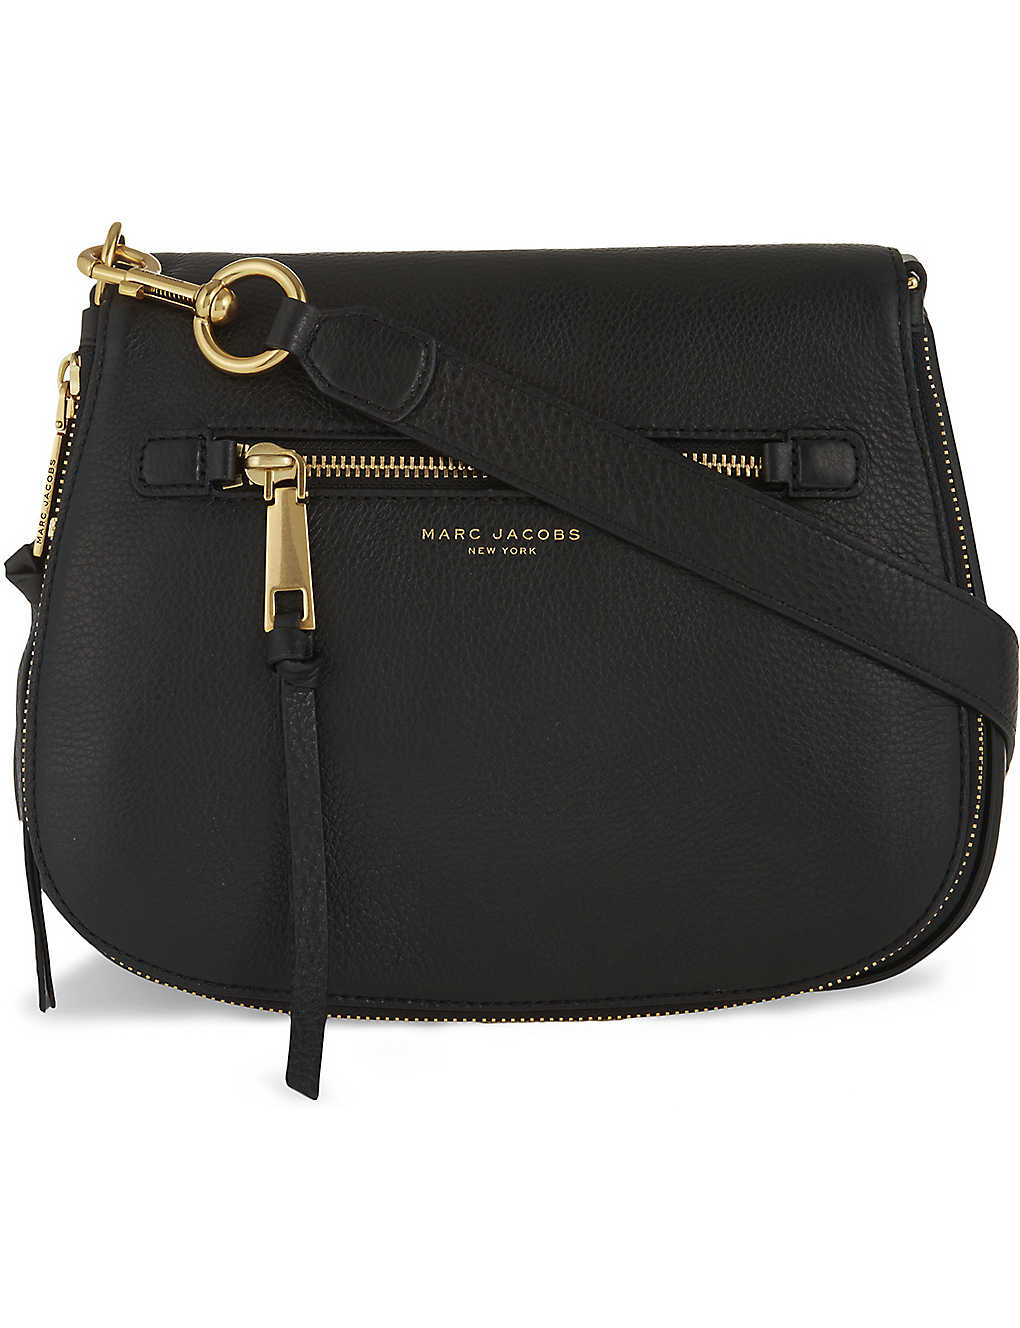 b708255ac9f3fb MARC JACOBS - Recruit leather saddle bag | Selfridges.com